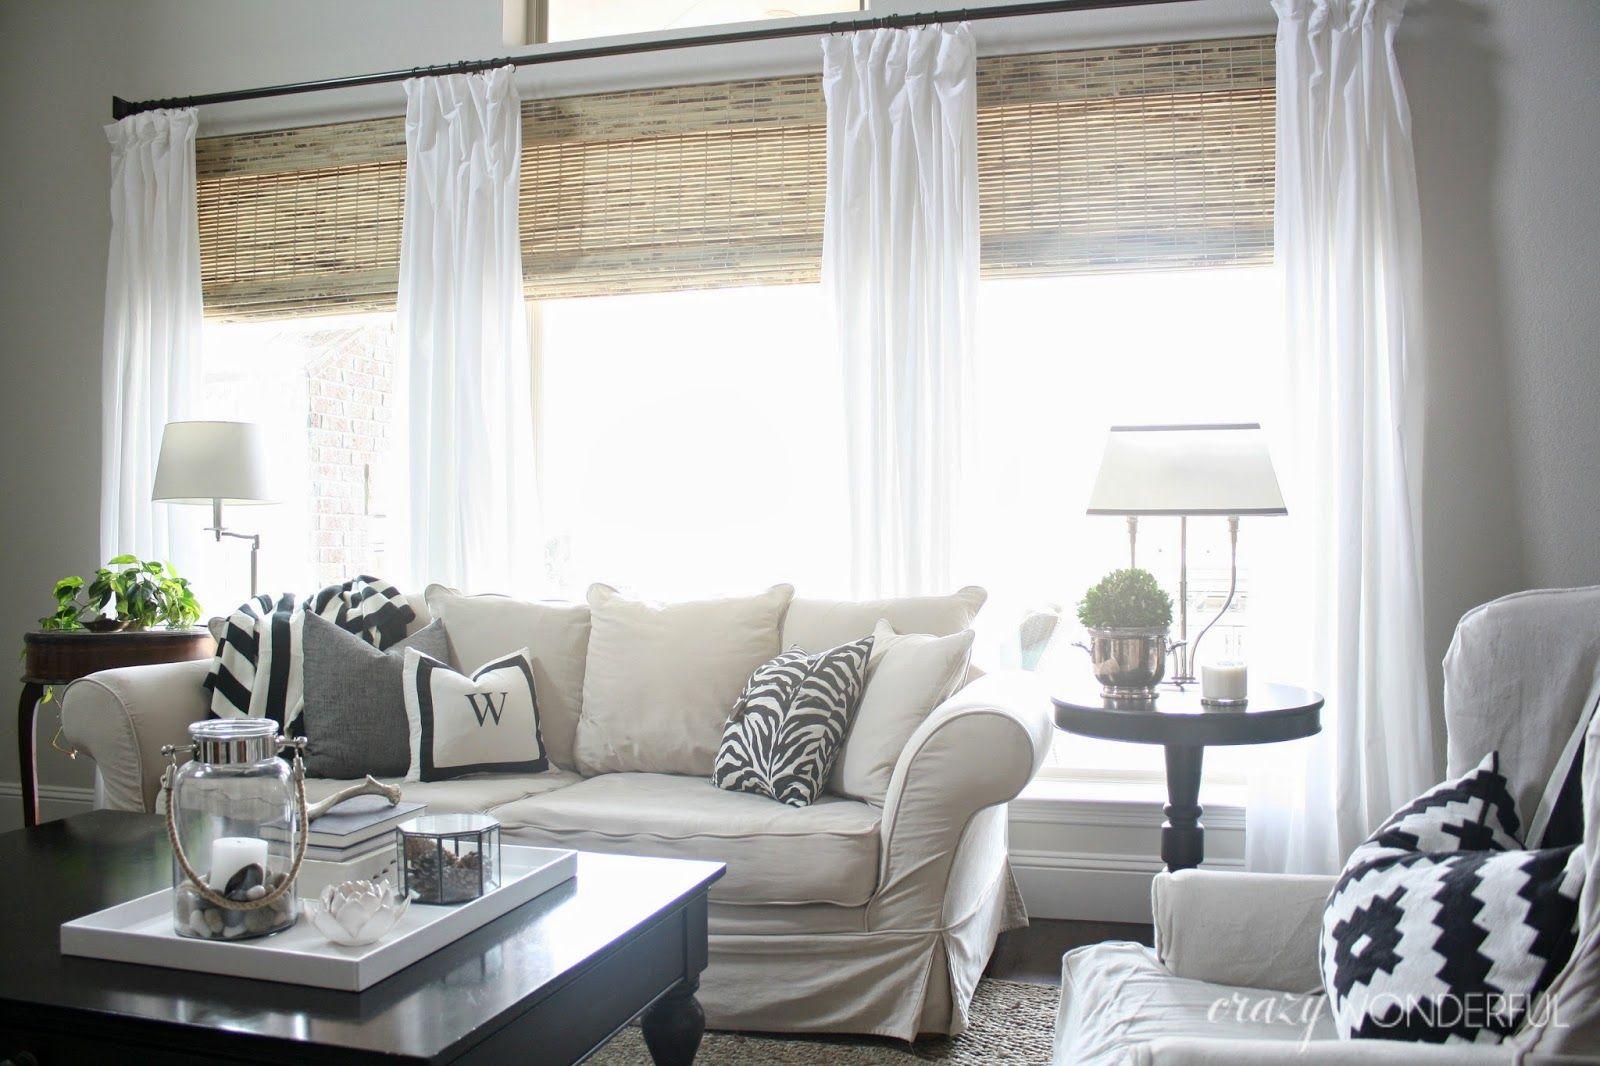 Bamboo house window design  bamboo roman shades  home decor  pinterest  bamboo roman shades